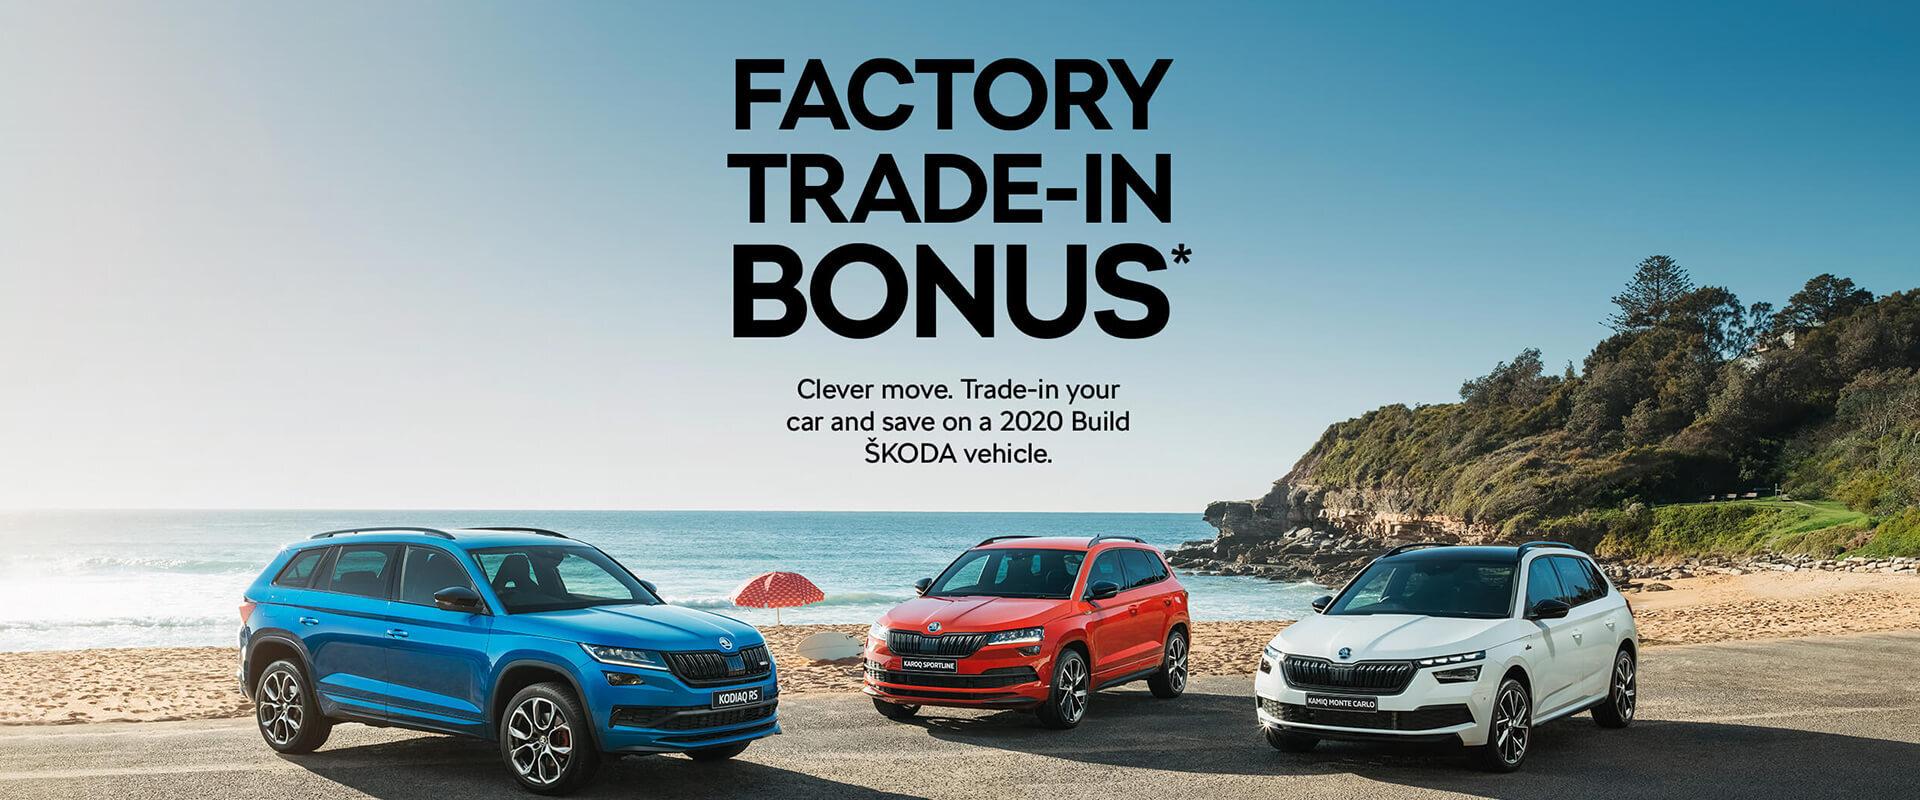 Skoda Factory Trade-In Bonus